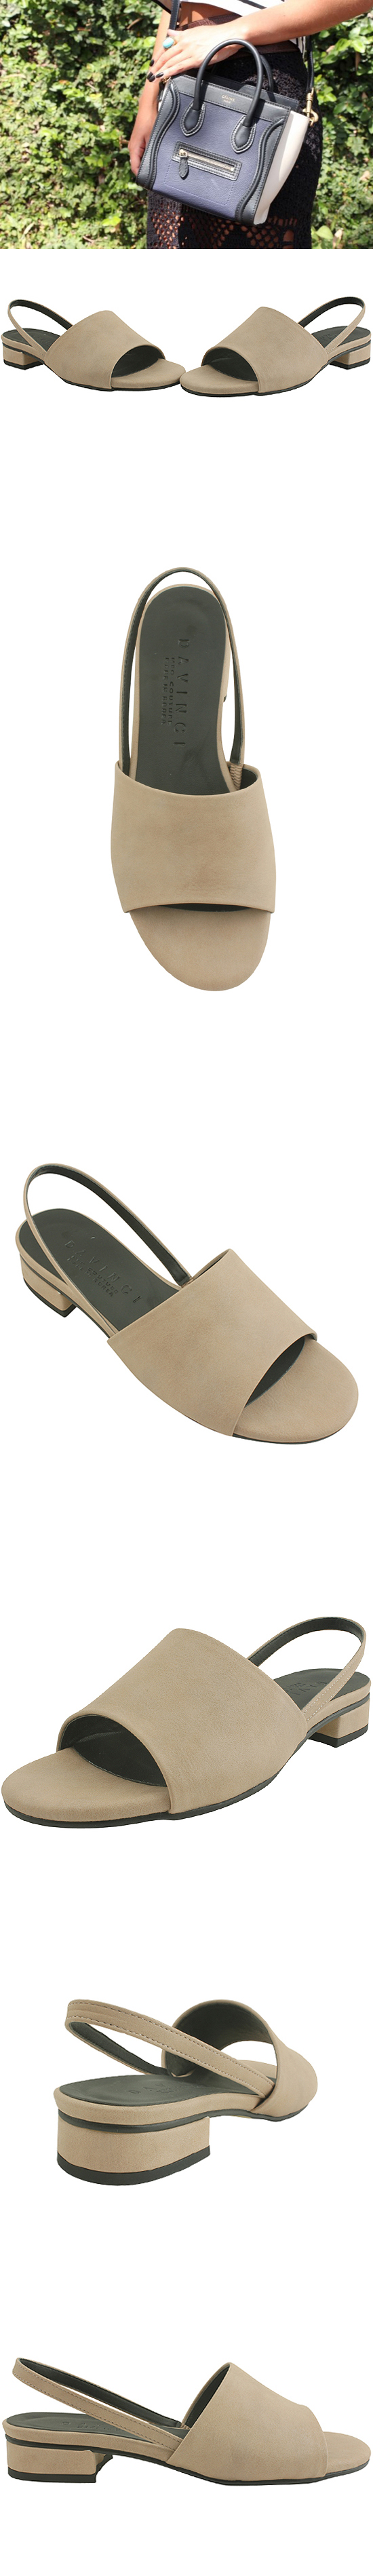 Flat toe open slingback sandals beige